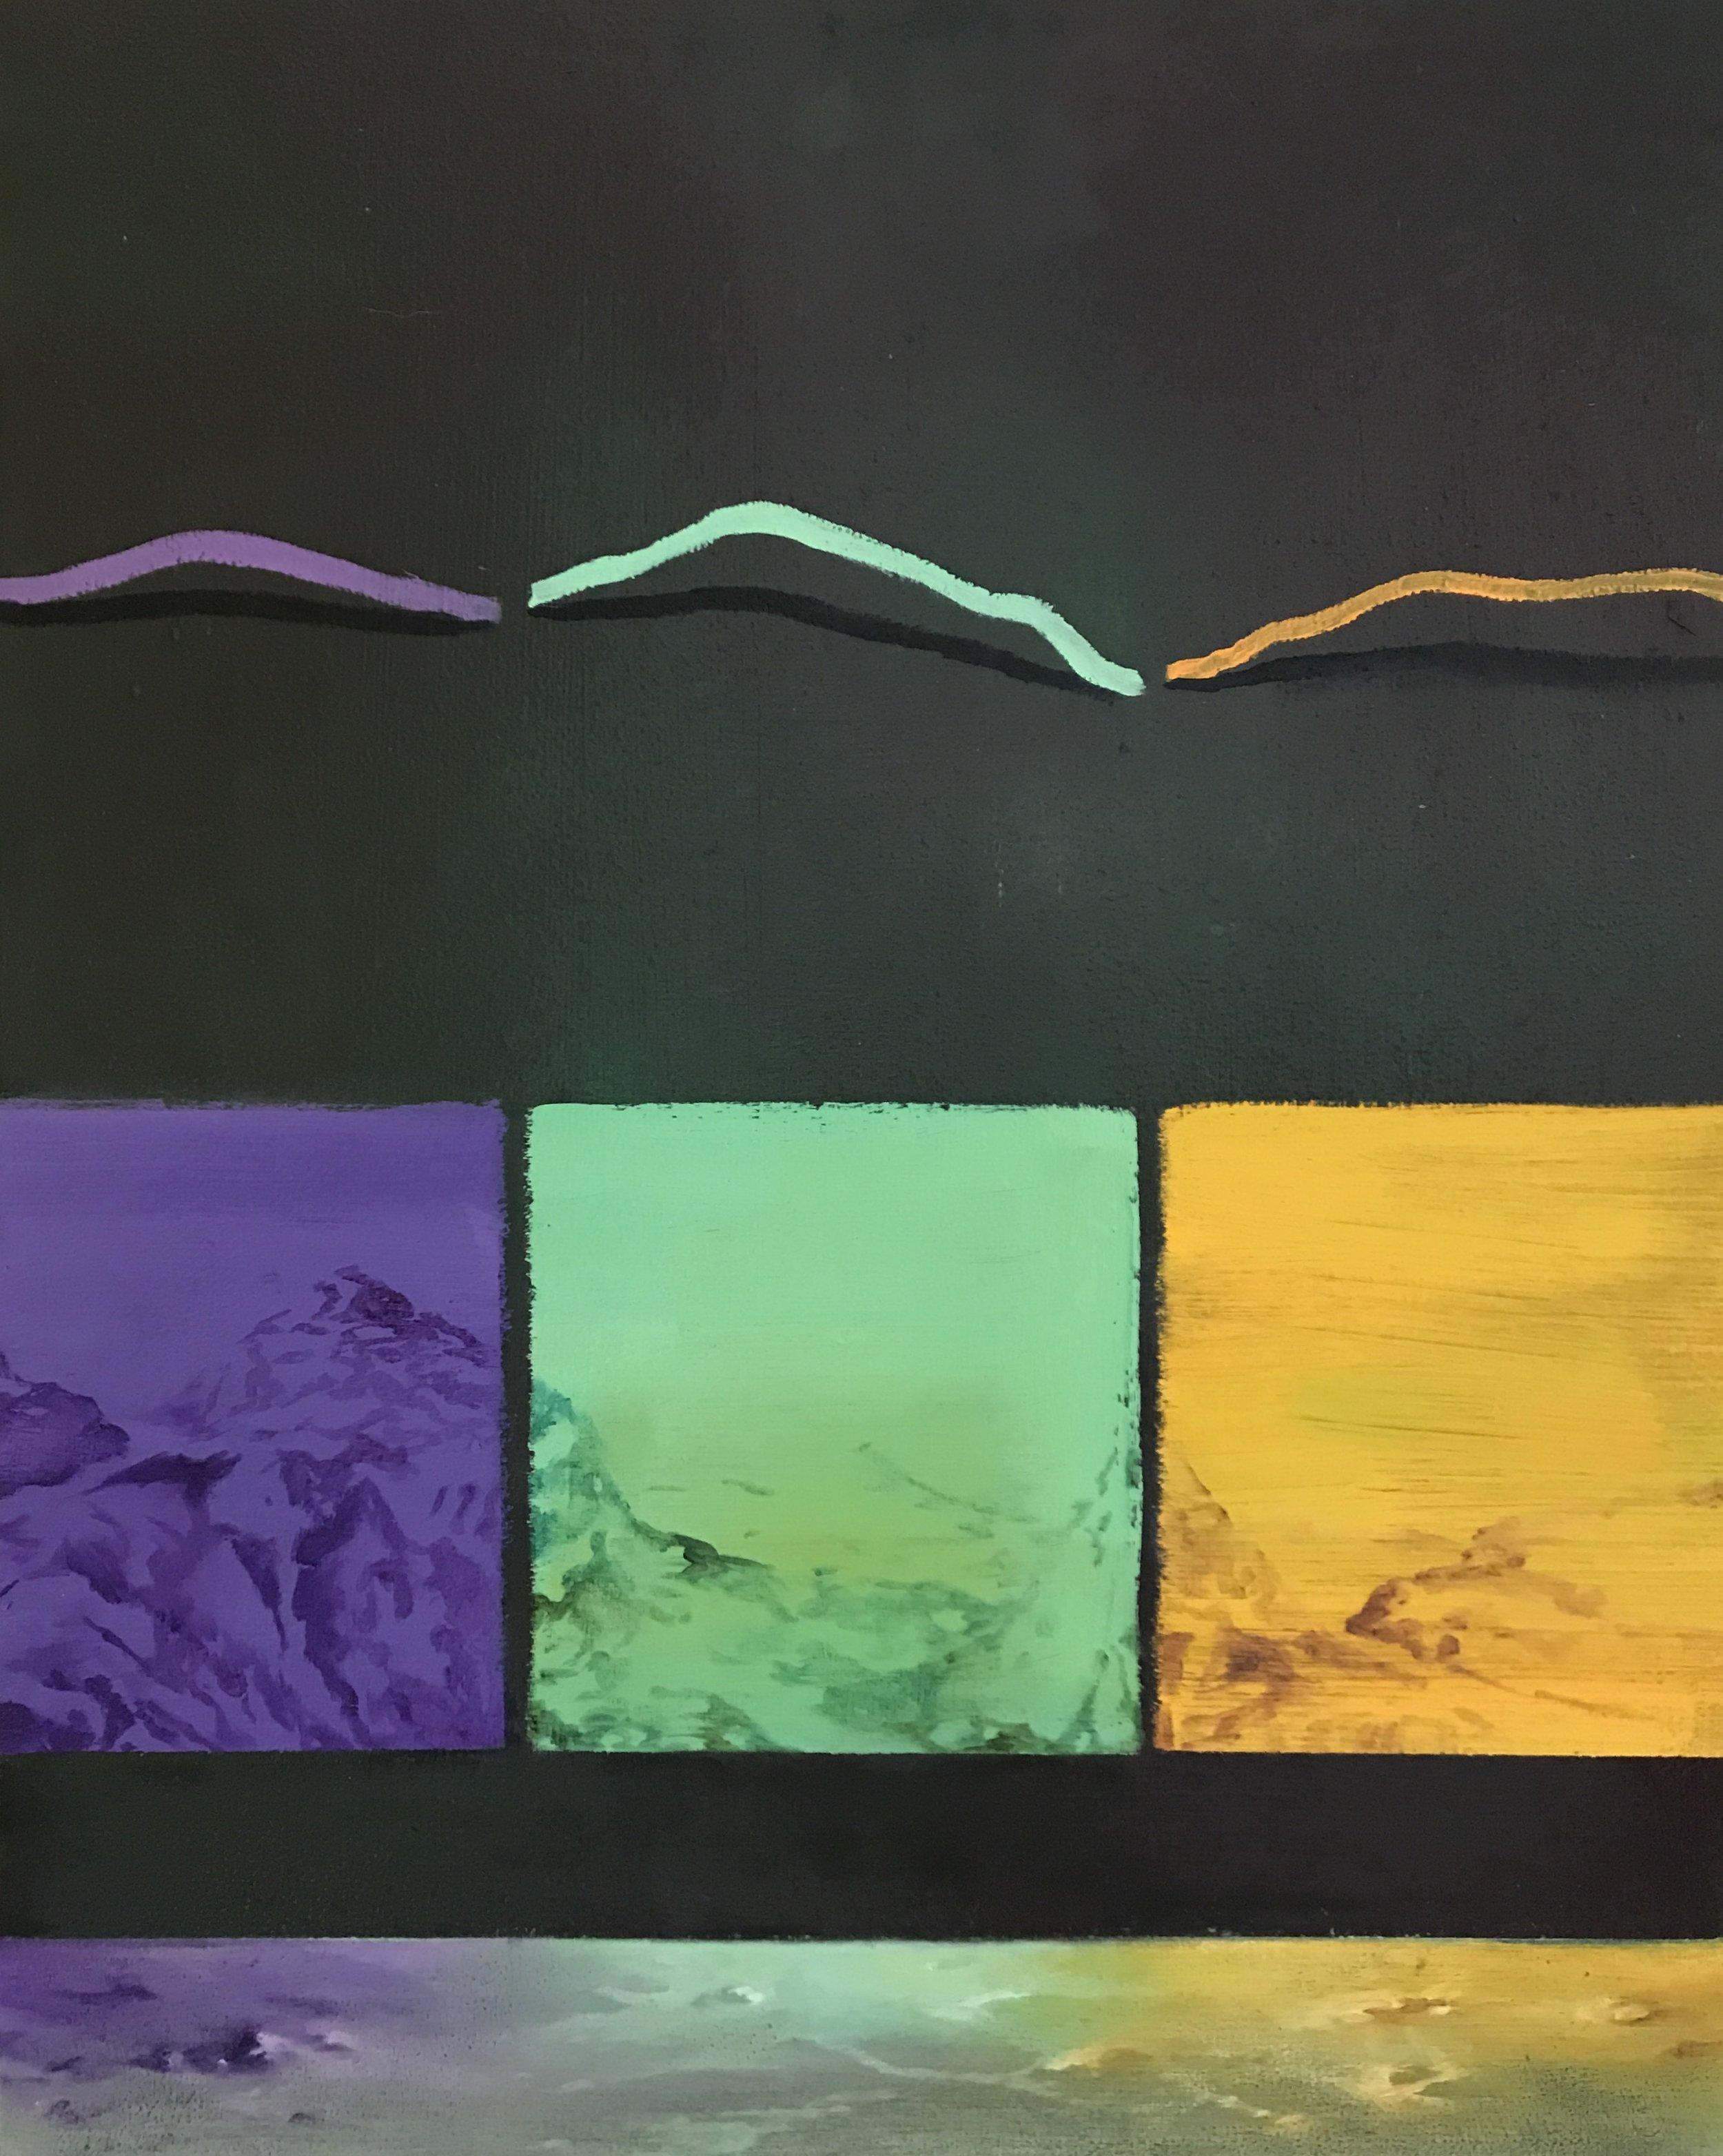 Adelheid De Witte, 'Welcome to the 4 Peaks Nightclub', 2018, oil on linen, 50 x 40cm